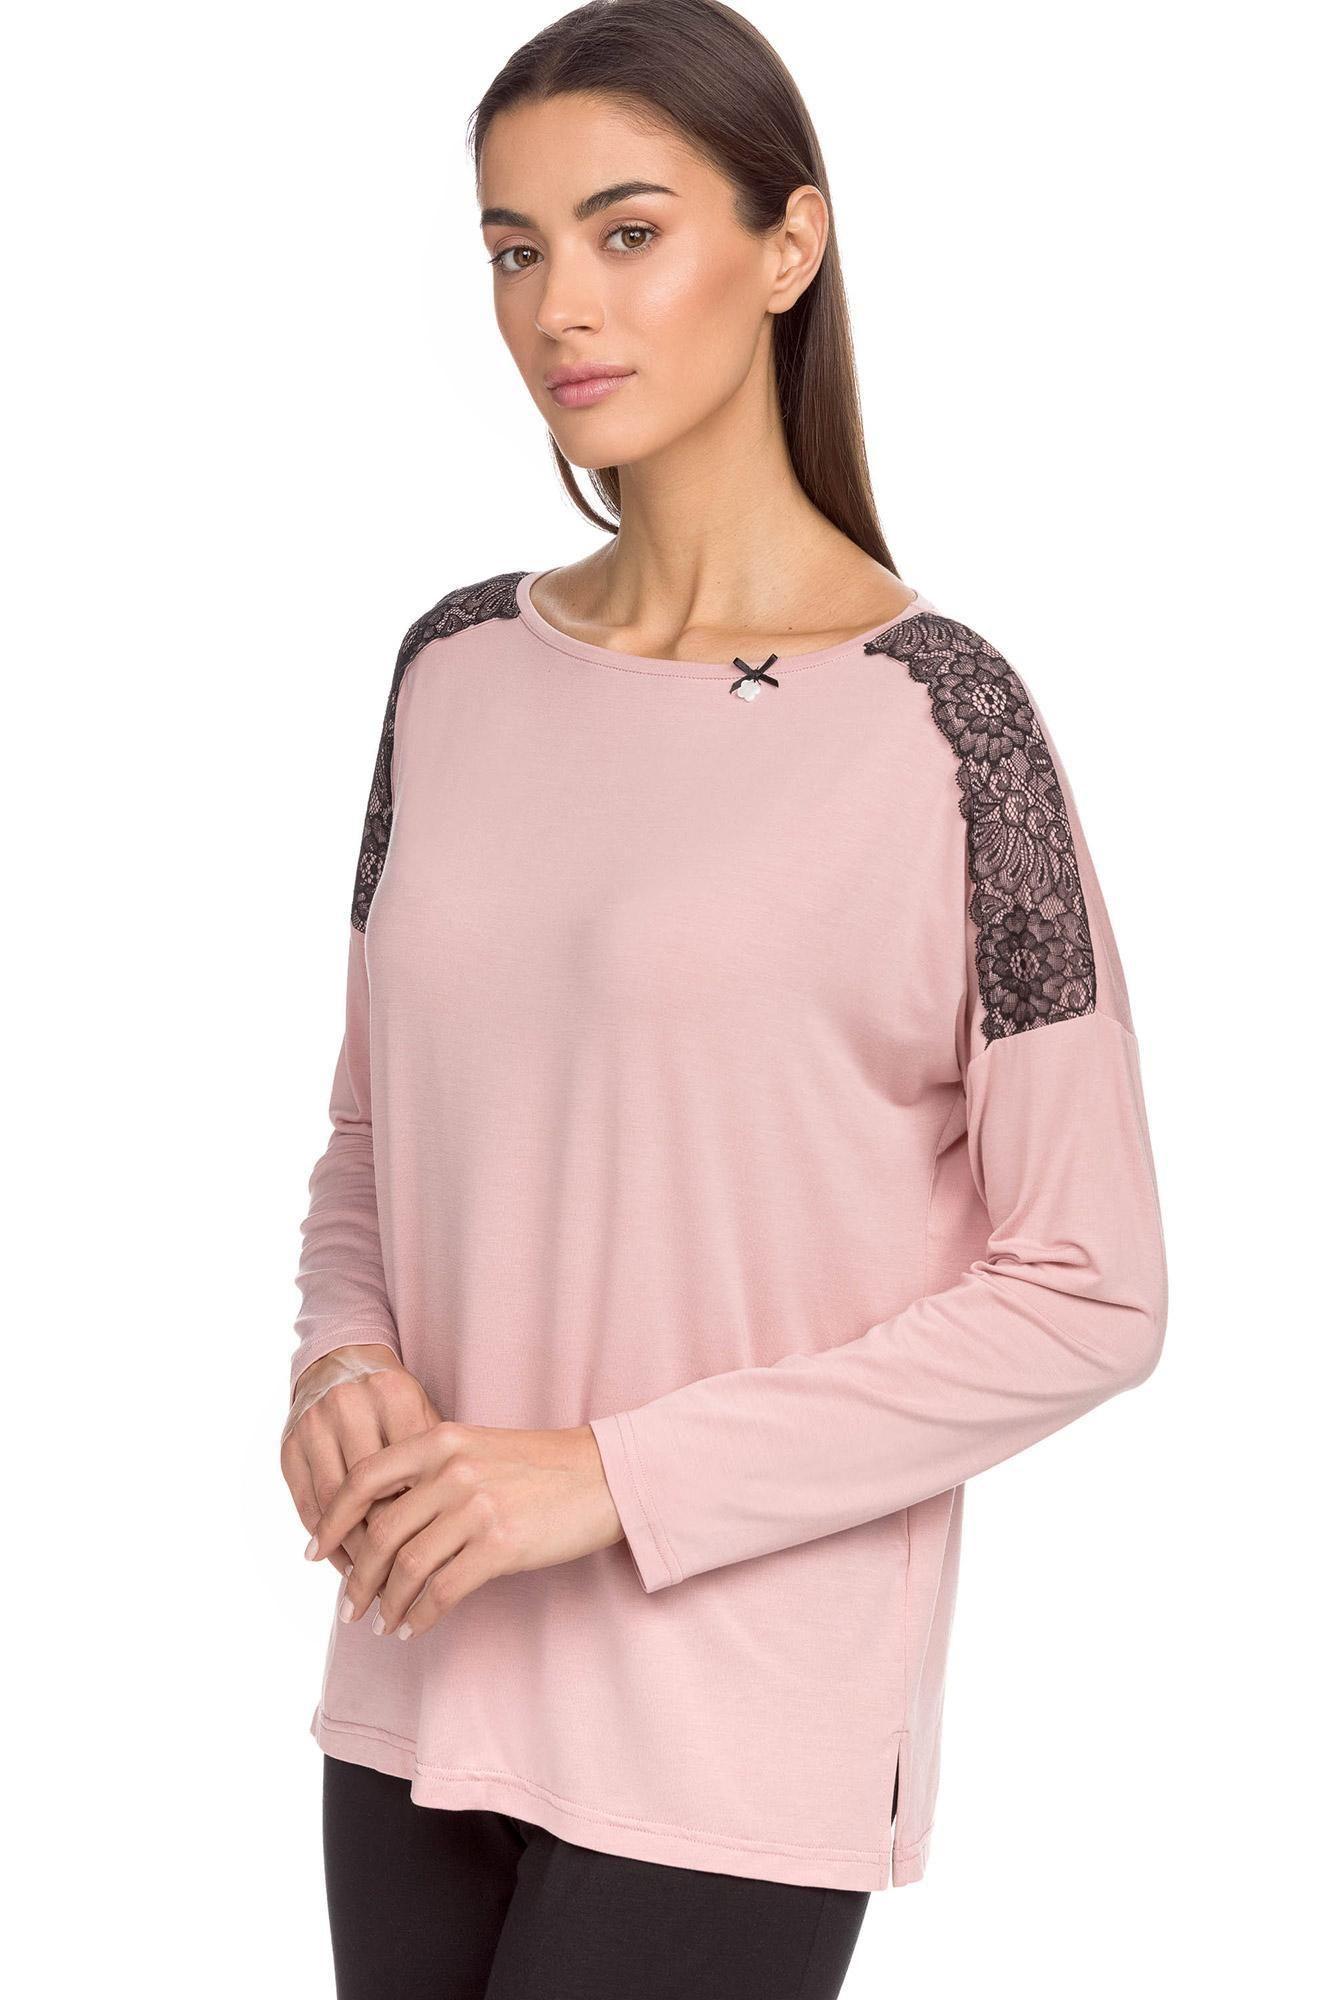 Women's Pyjamas with details